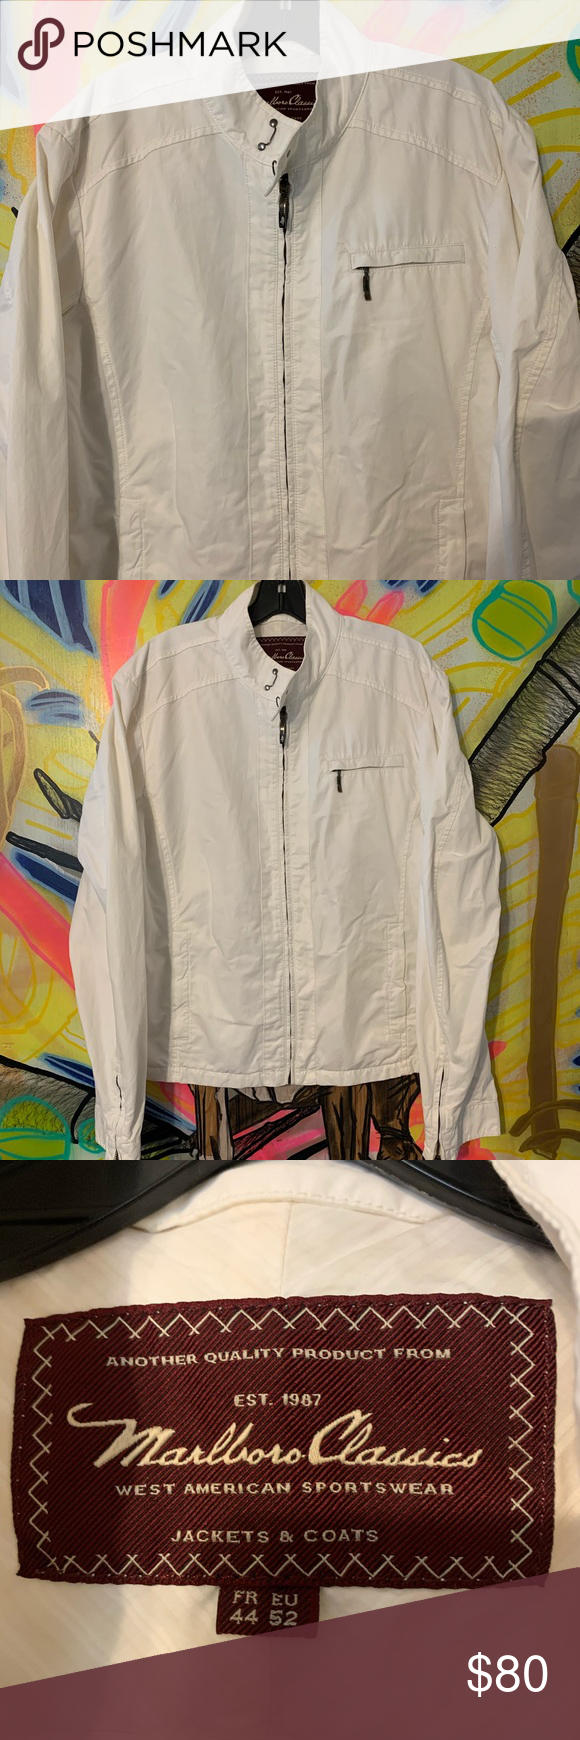 Vintage Marlboro Classics Casual Racing Jacket M Marlboro Classics Jackets Lightweight Shirts